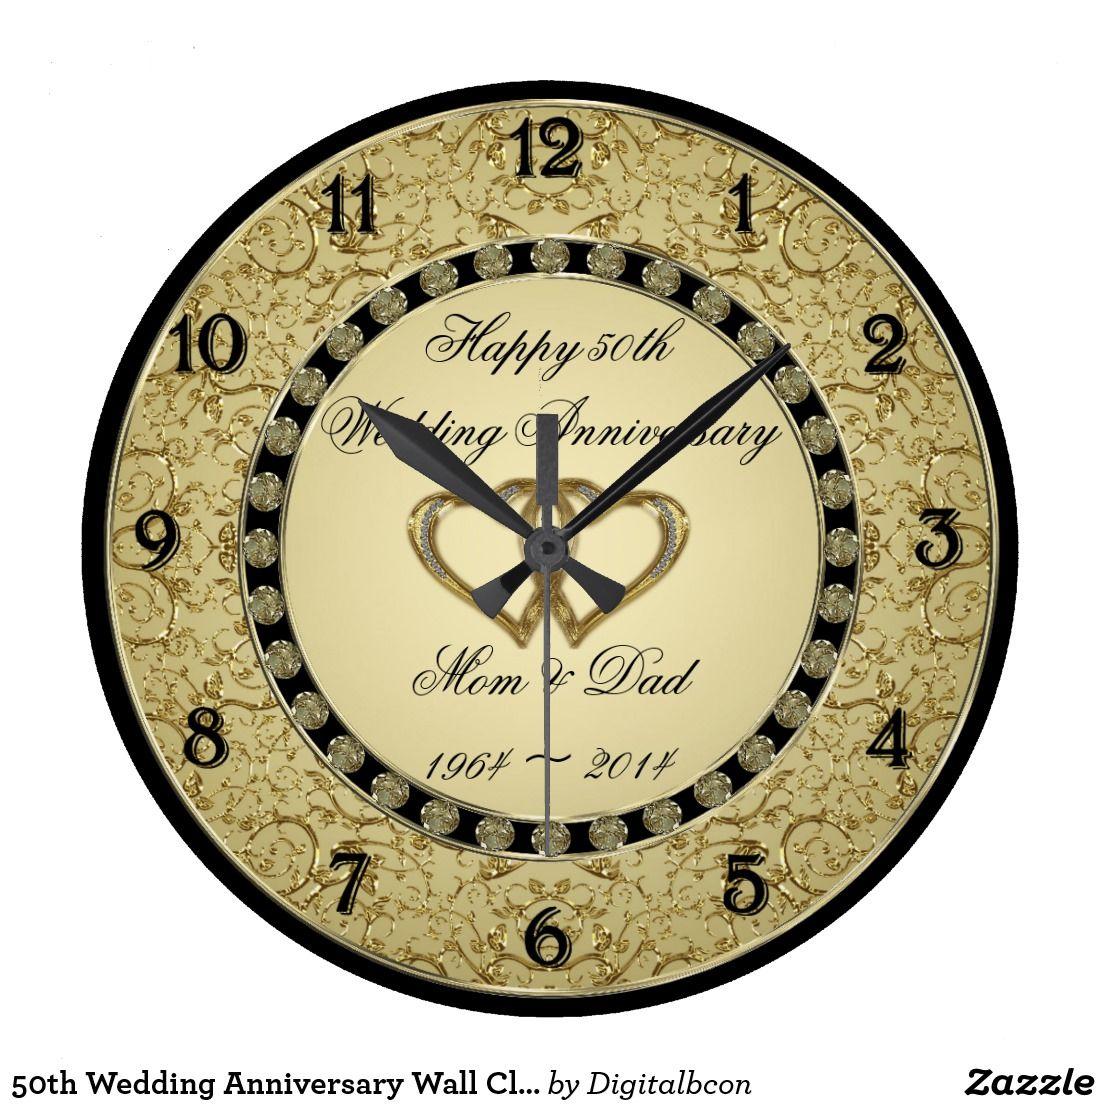 50th Wedding Anniversary Wall Clock Zazzle Com In 2020 Golden Wedding Anniversary Golden Wedding Wedding Anniversary